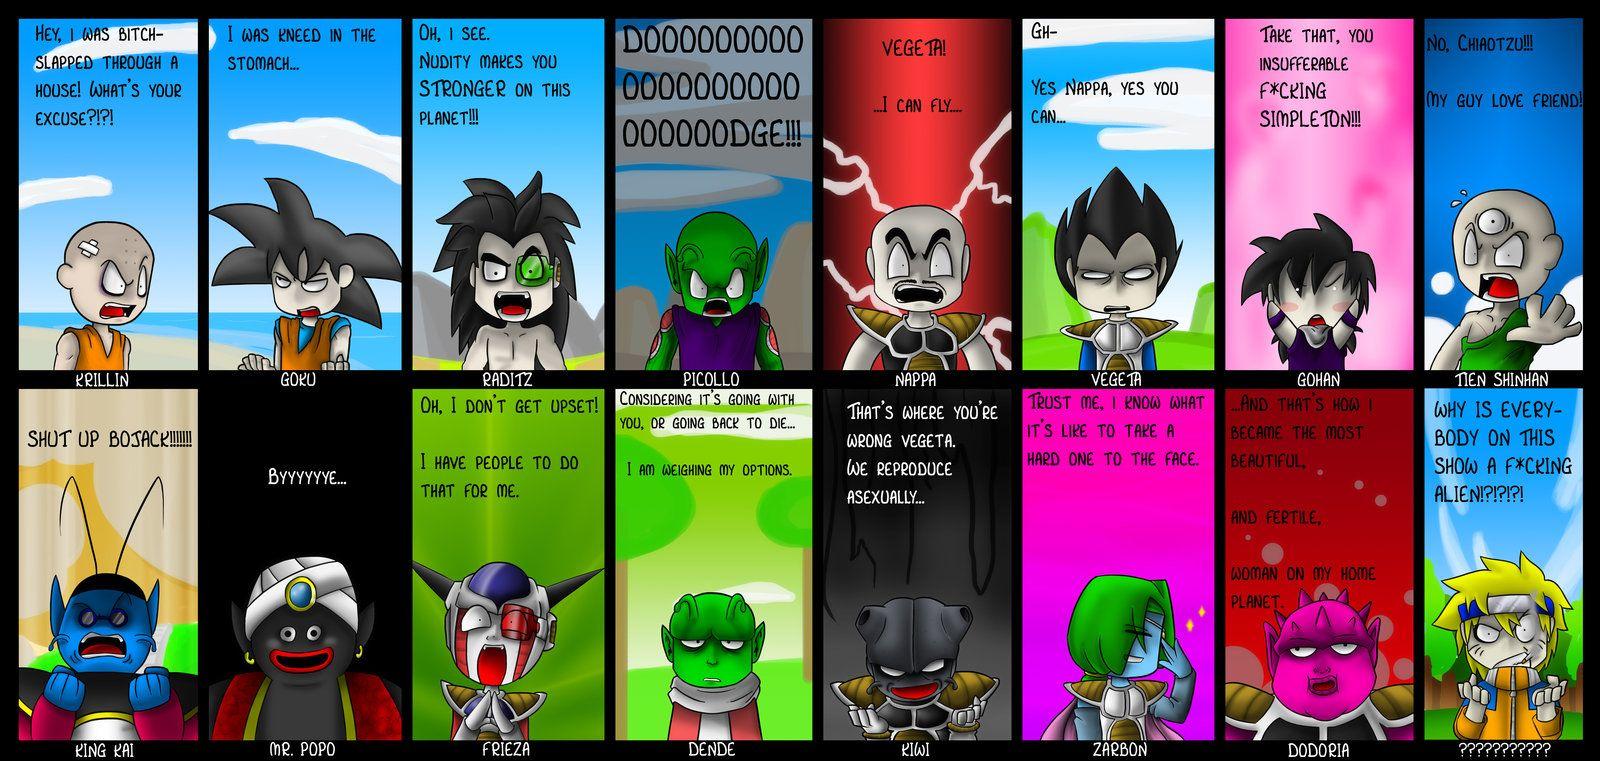 Funny Dragon Ball Z Abridged Memes : Funny dbz comics best of dragonball z abridged by